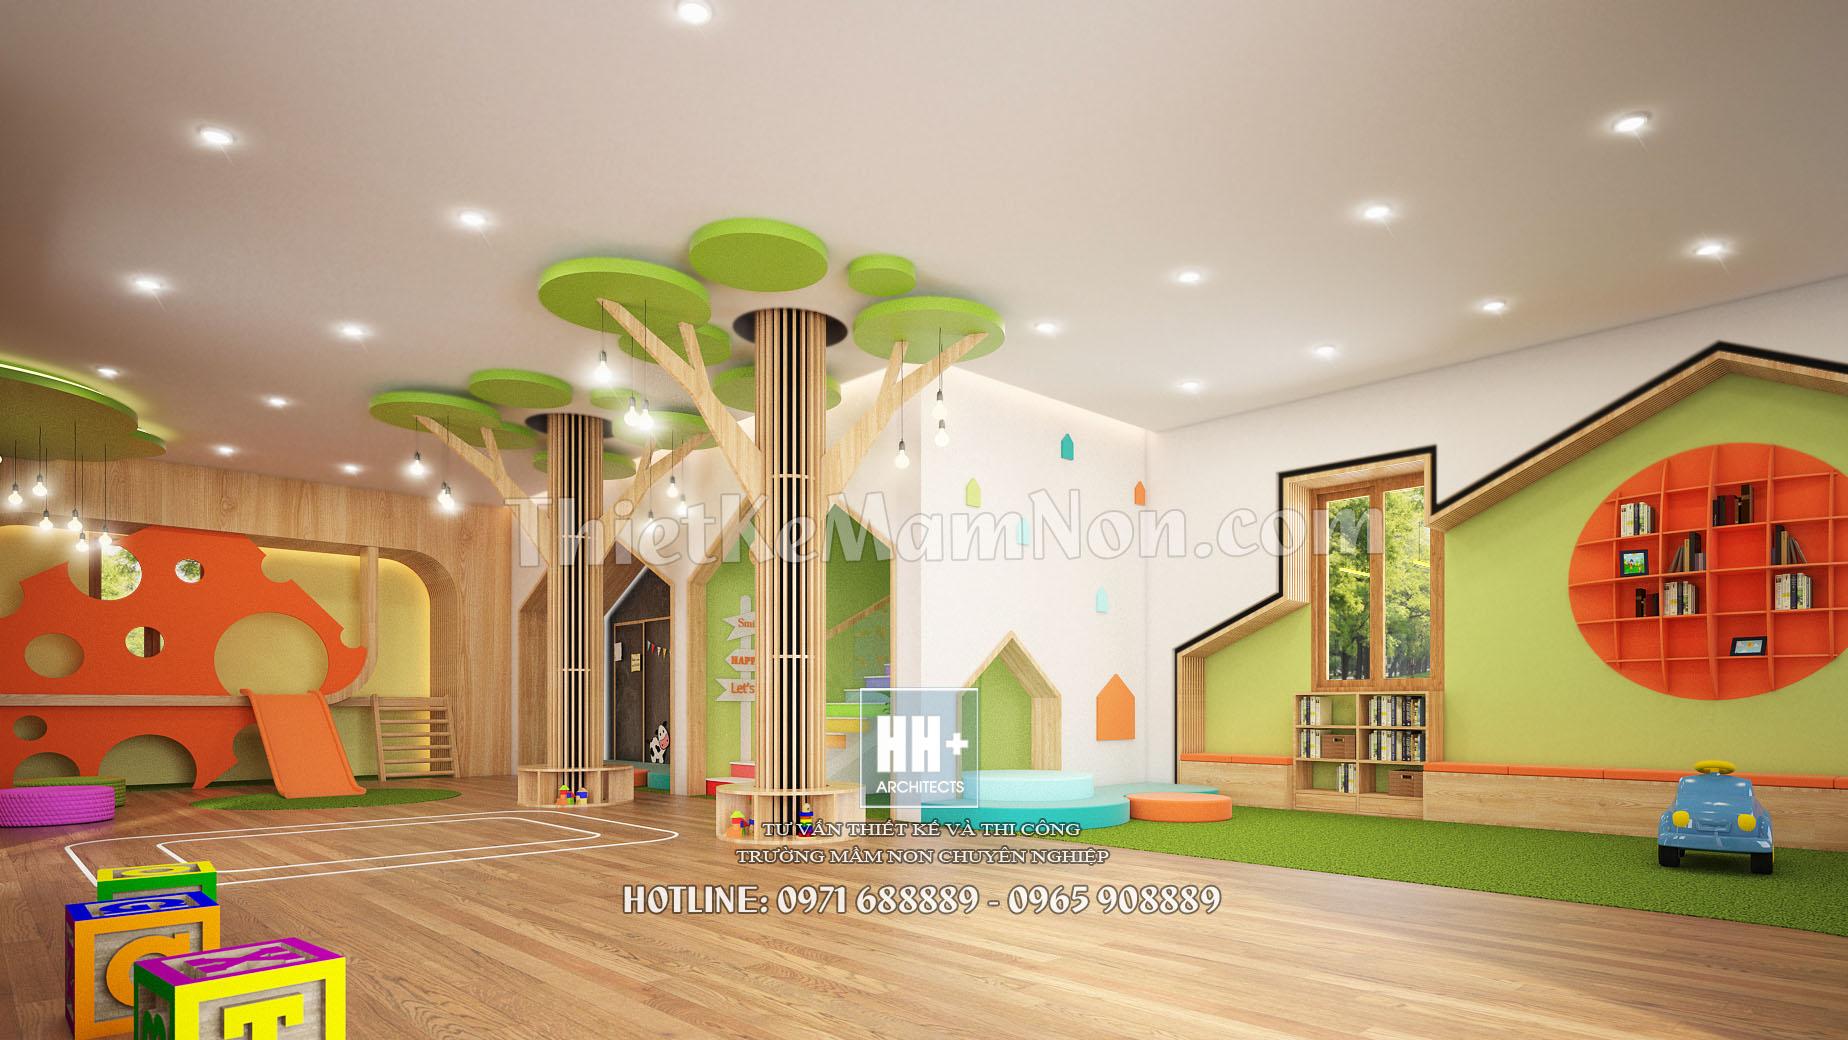 3 thiết kế trường mầm non montessori Thiết kế trường mầm non montessori Việt Anh 3 1